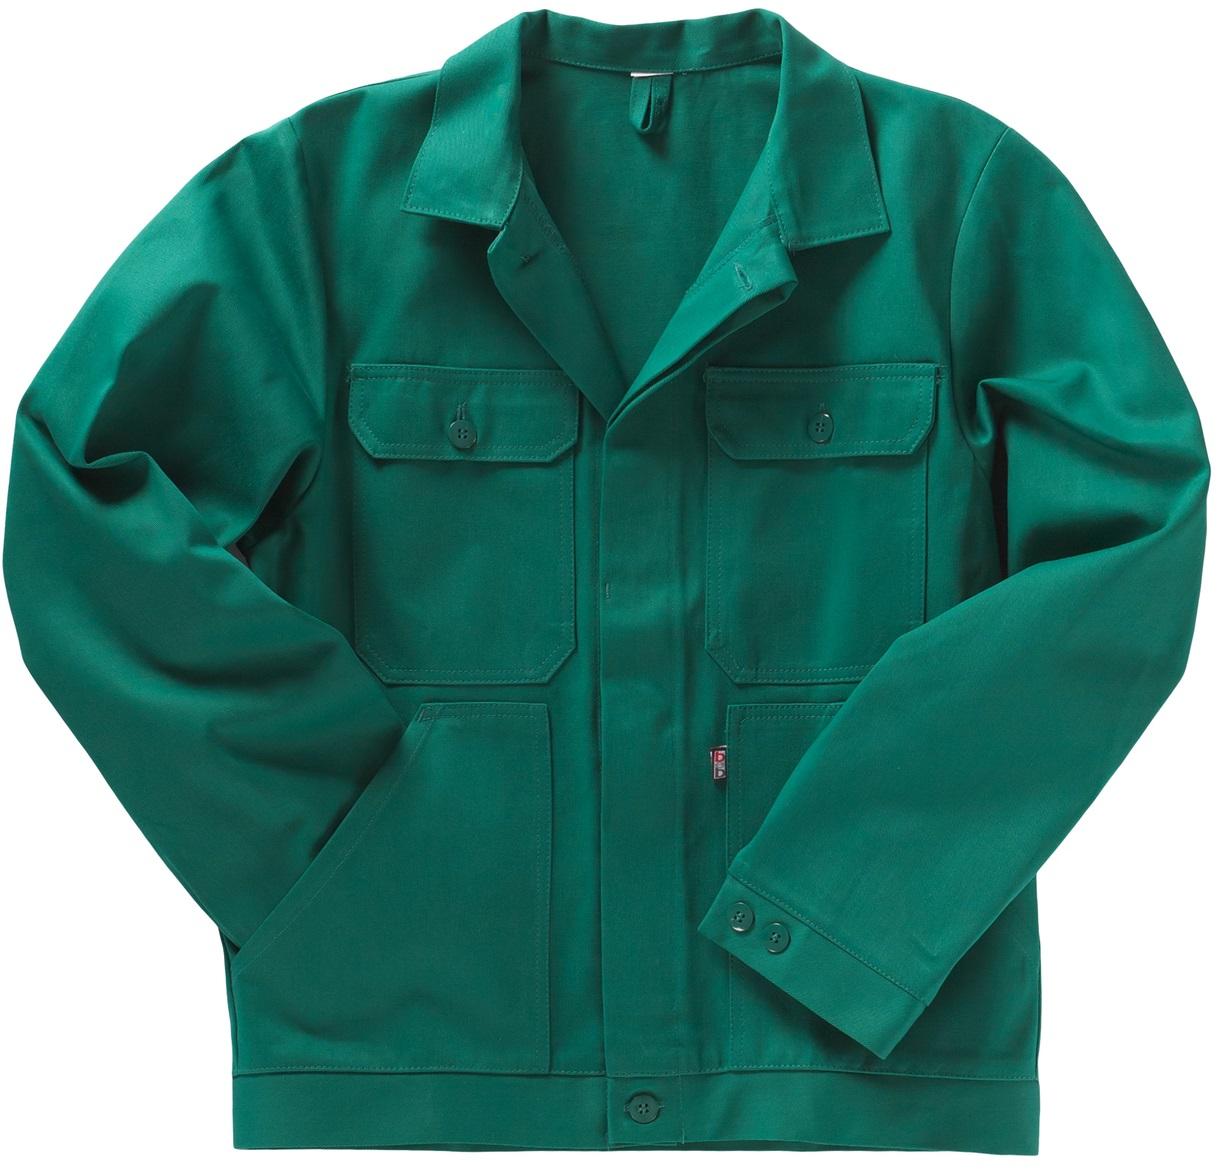 Arbeitsanzug Hose Jacke Kübler Baumwolle BW.neu Anzug rot Berufskleidung